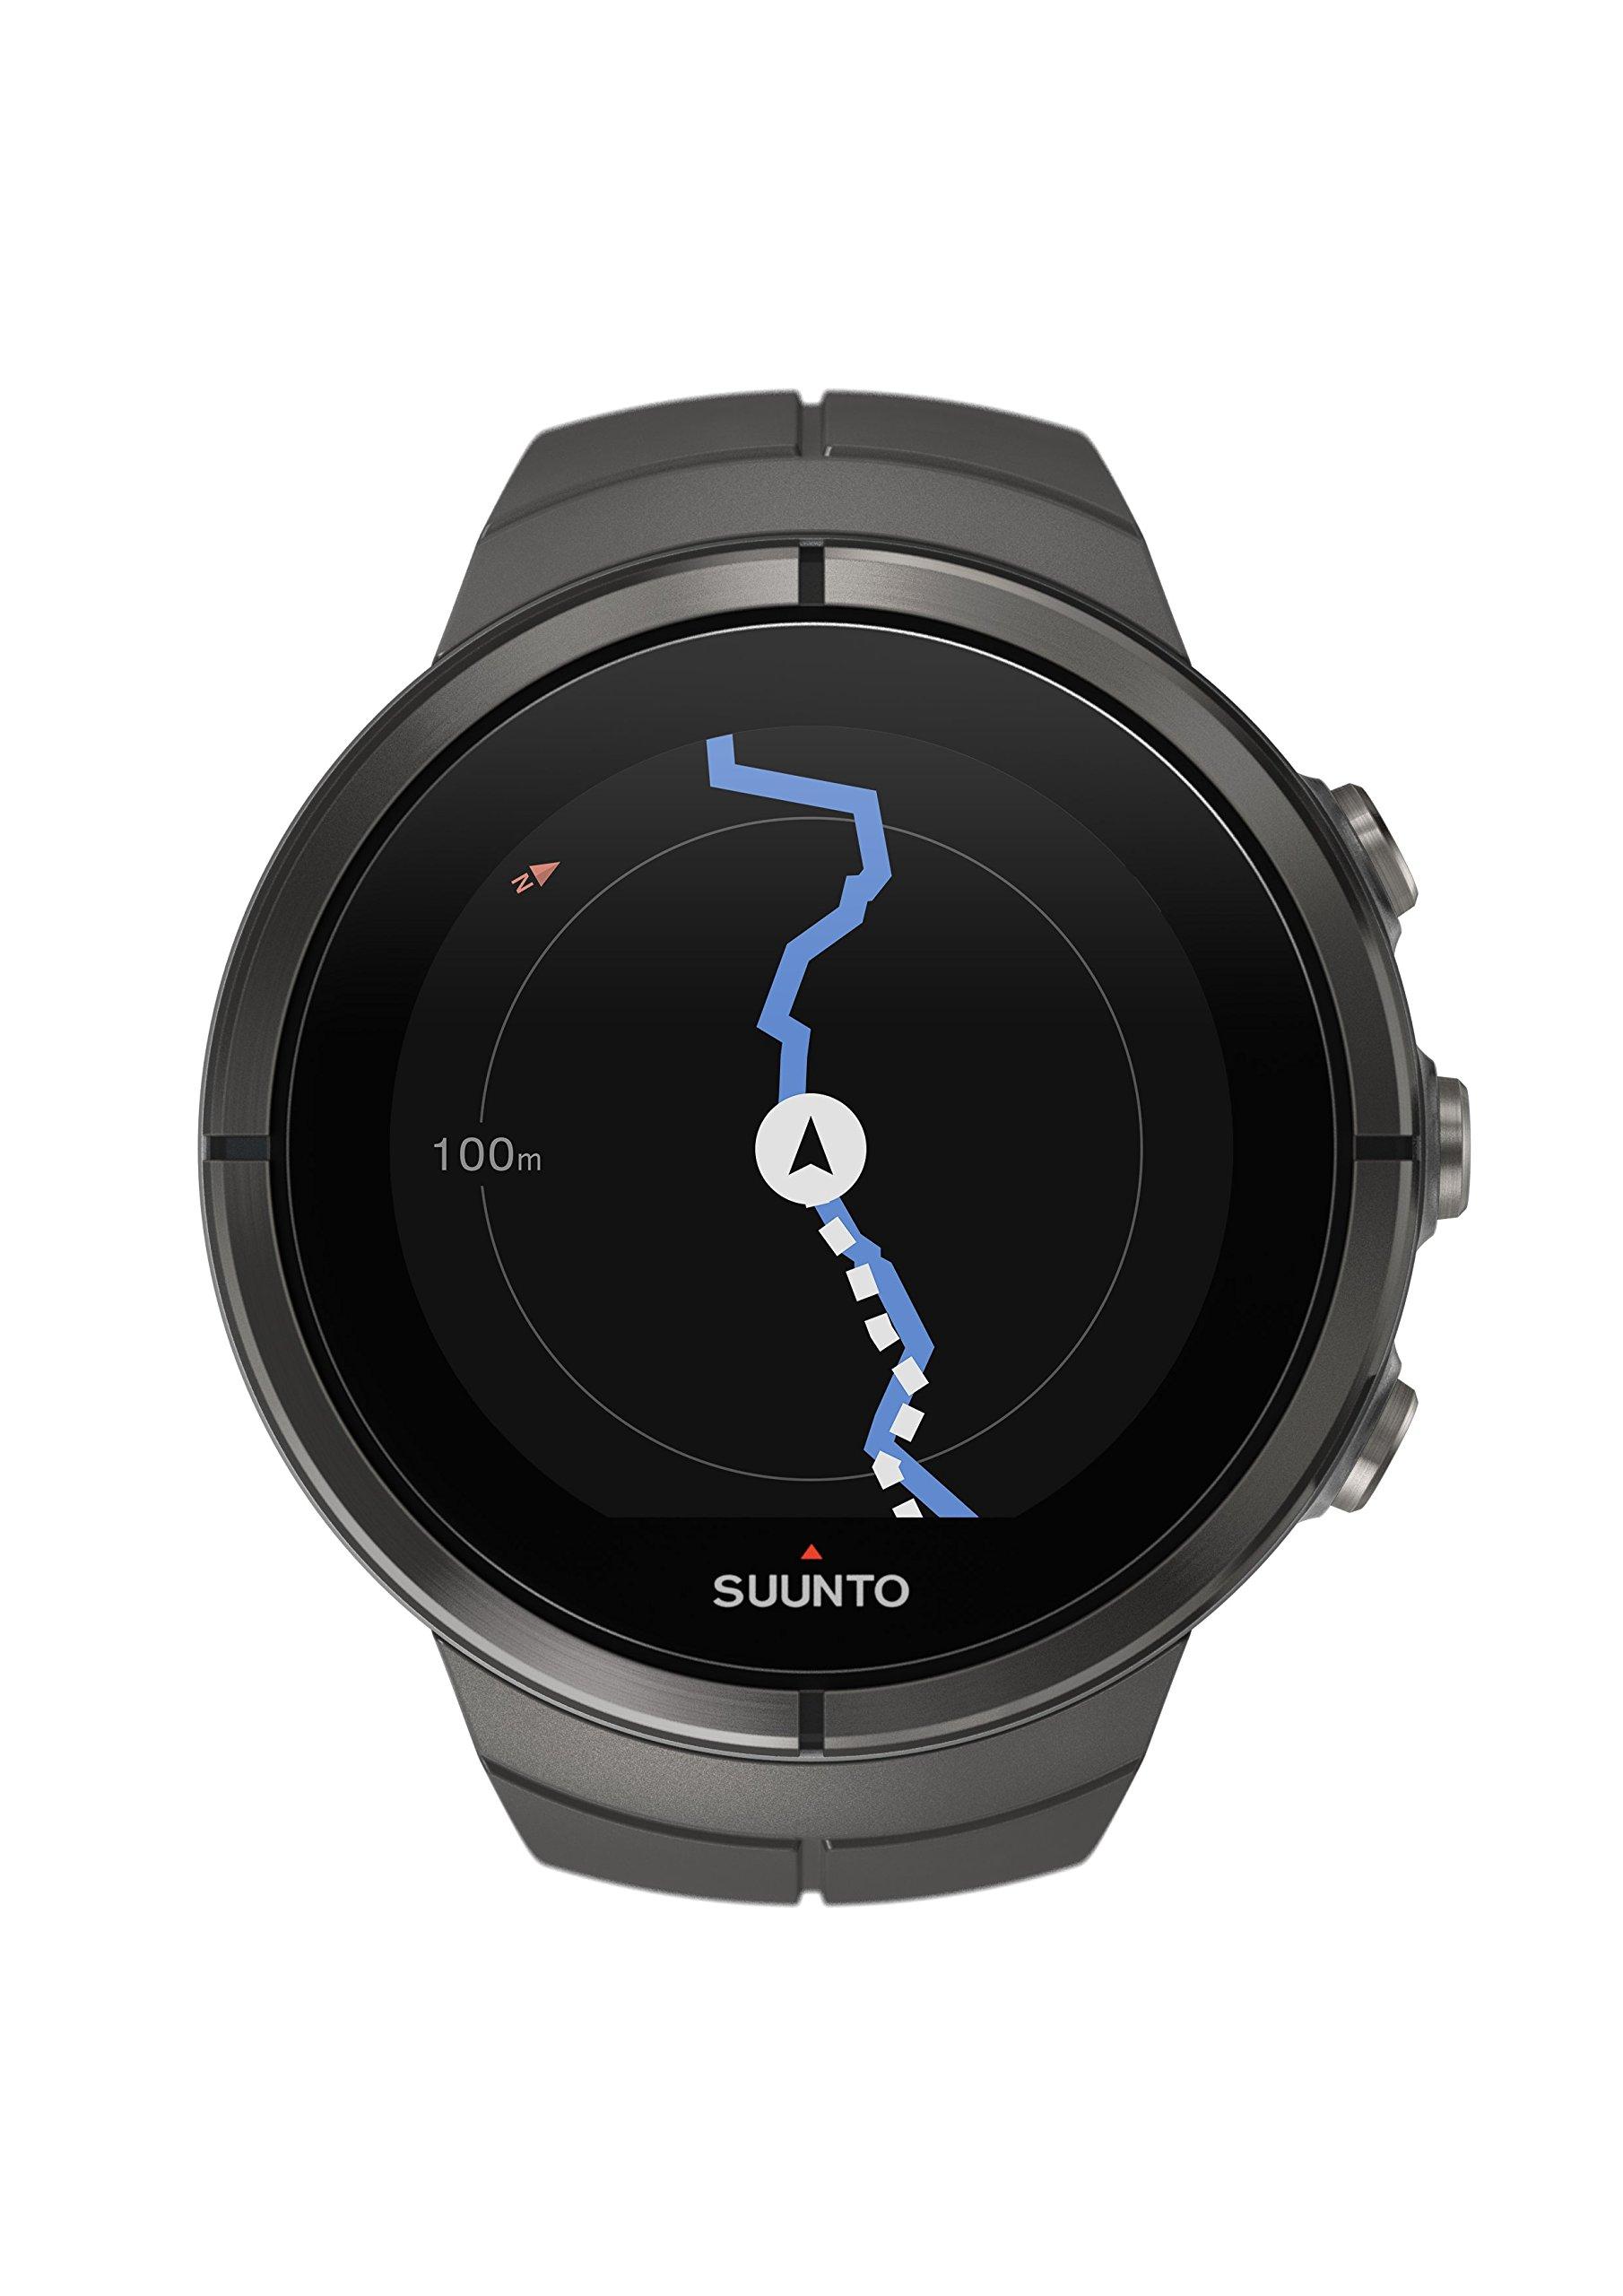 Suunto Spartan Ultra Stealth Titanium - Multisport GPS Watch